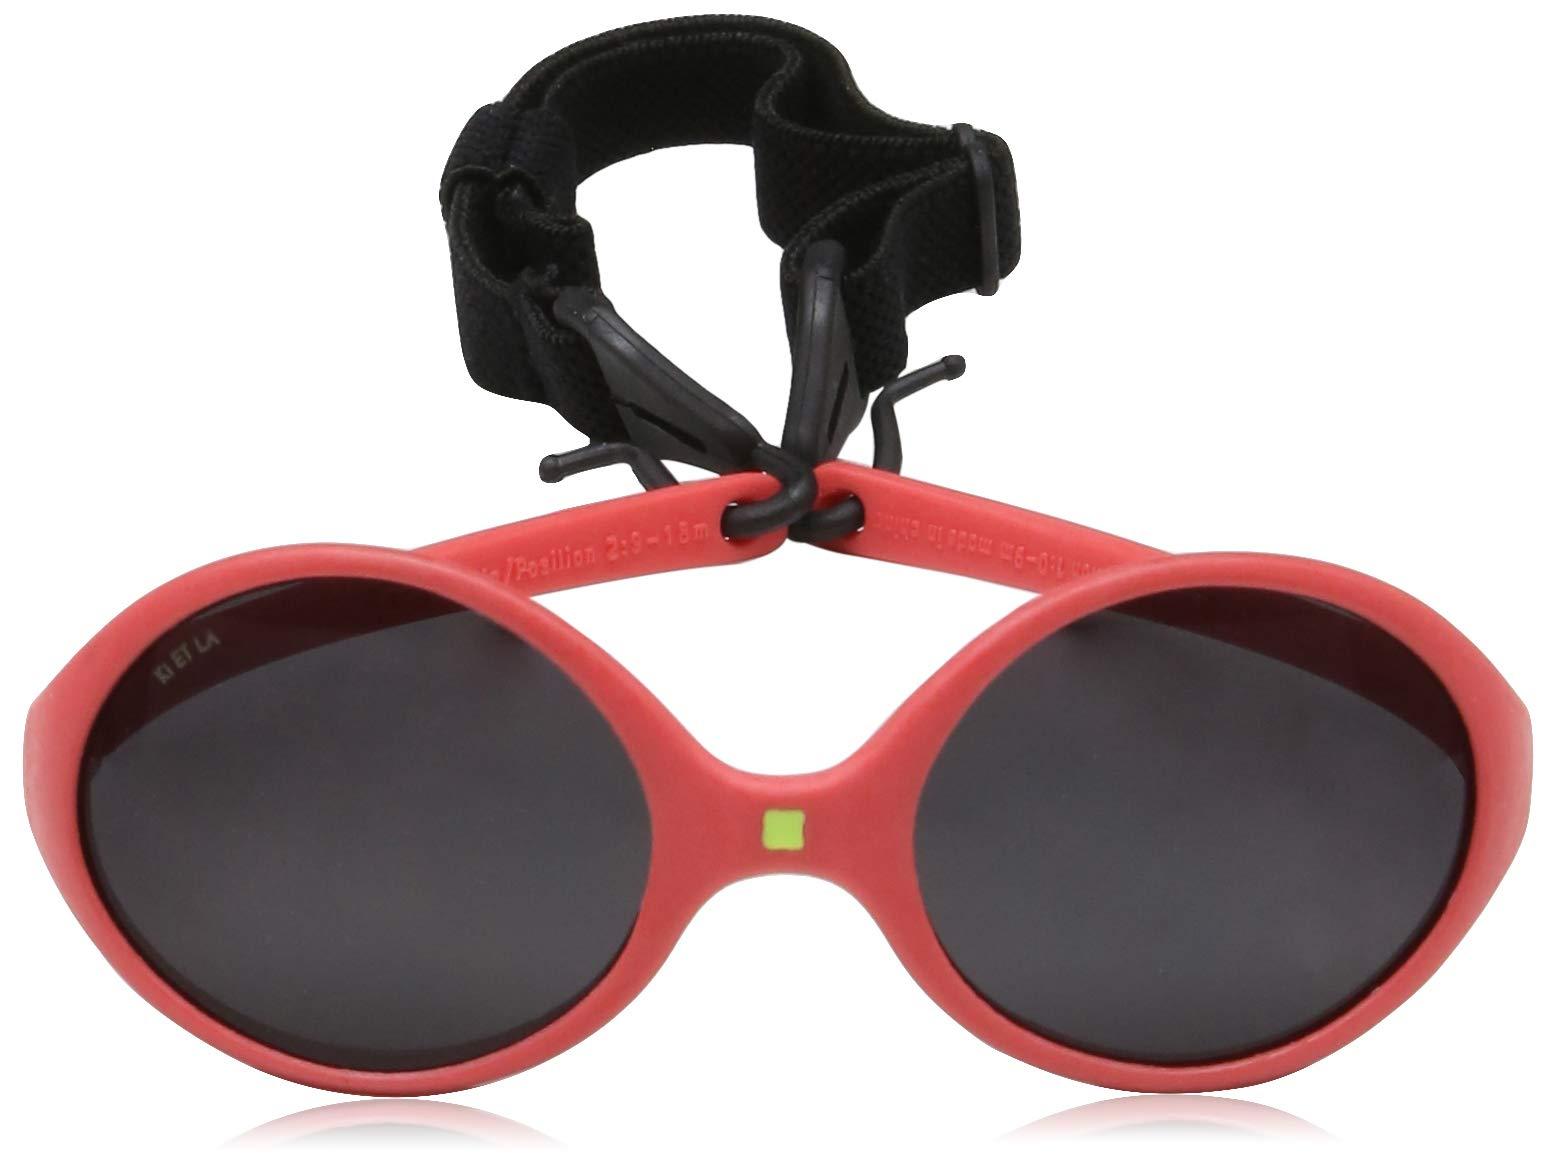 Ki ET LA – Gafas de sol para Bebé modelo Diabola – 100% irrompibles – 0-18 meses 2